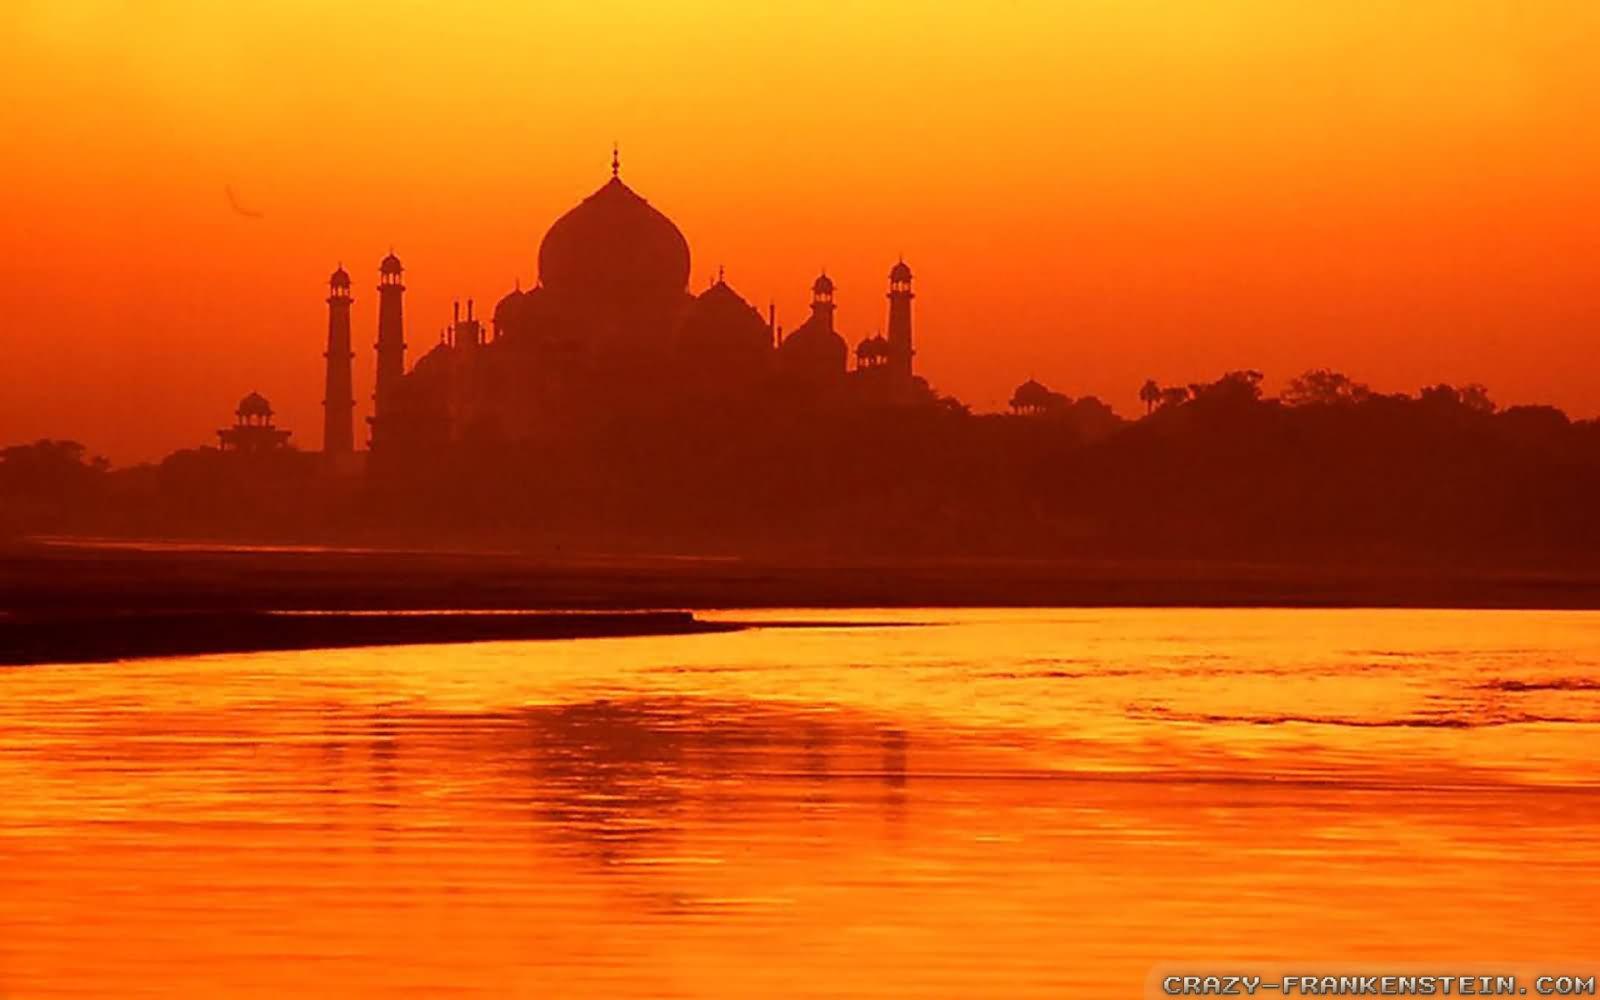 incredible sun set view - photo #13